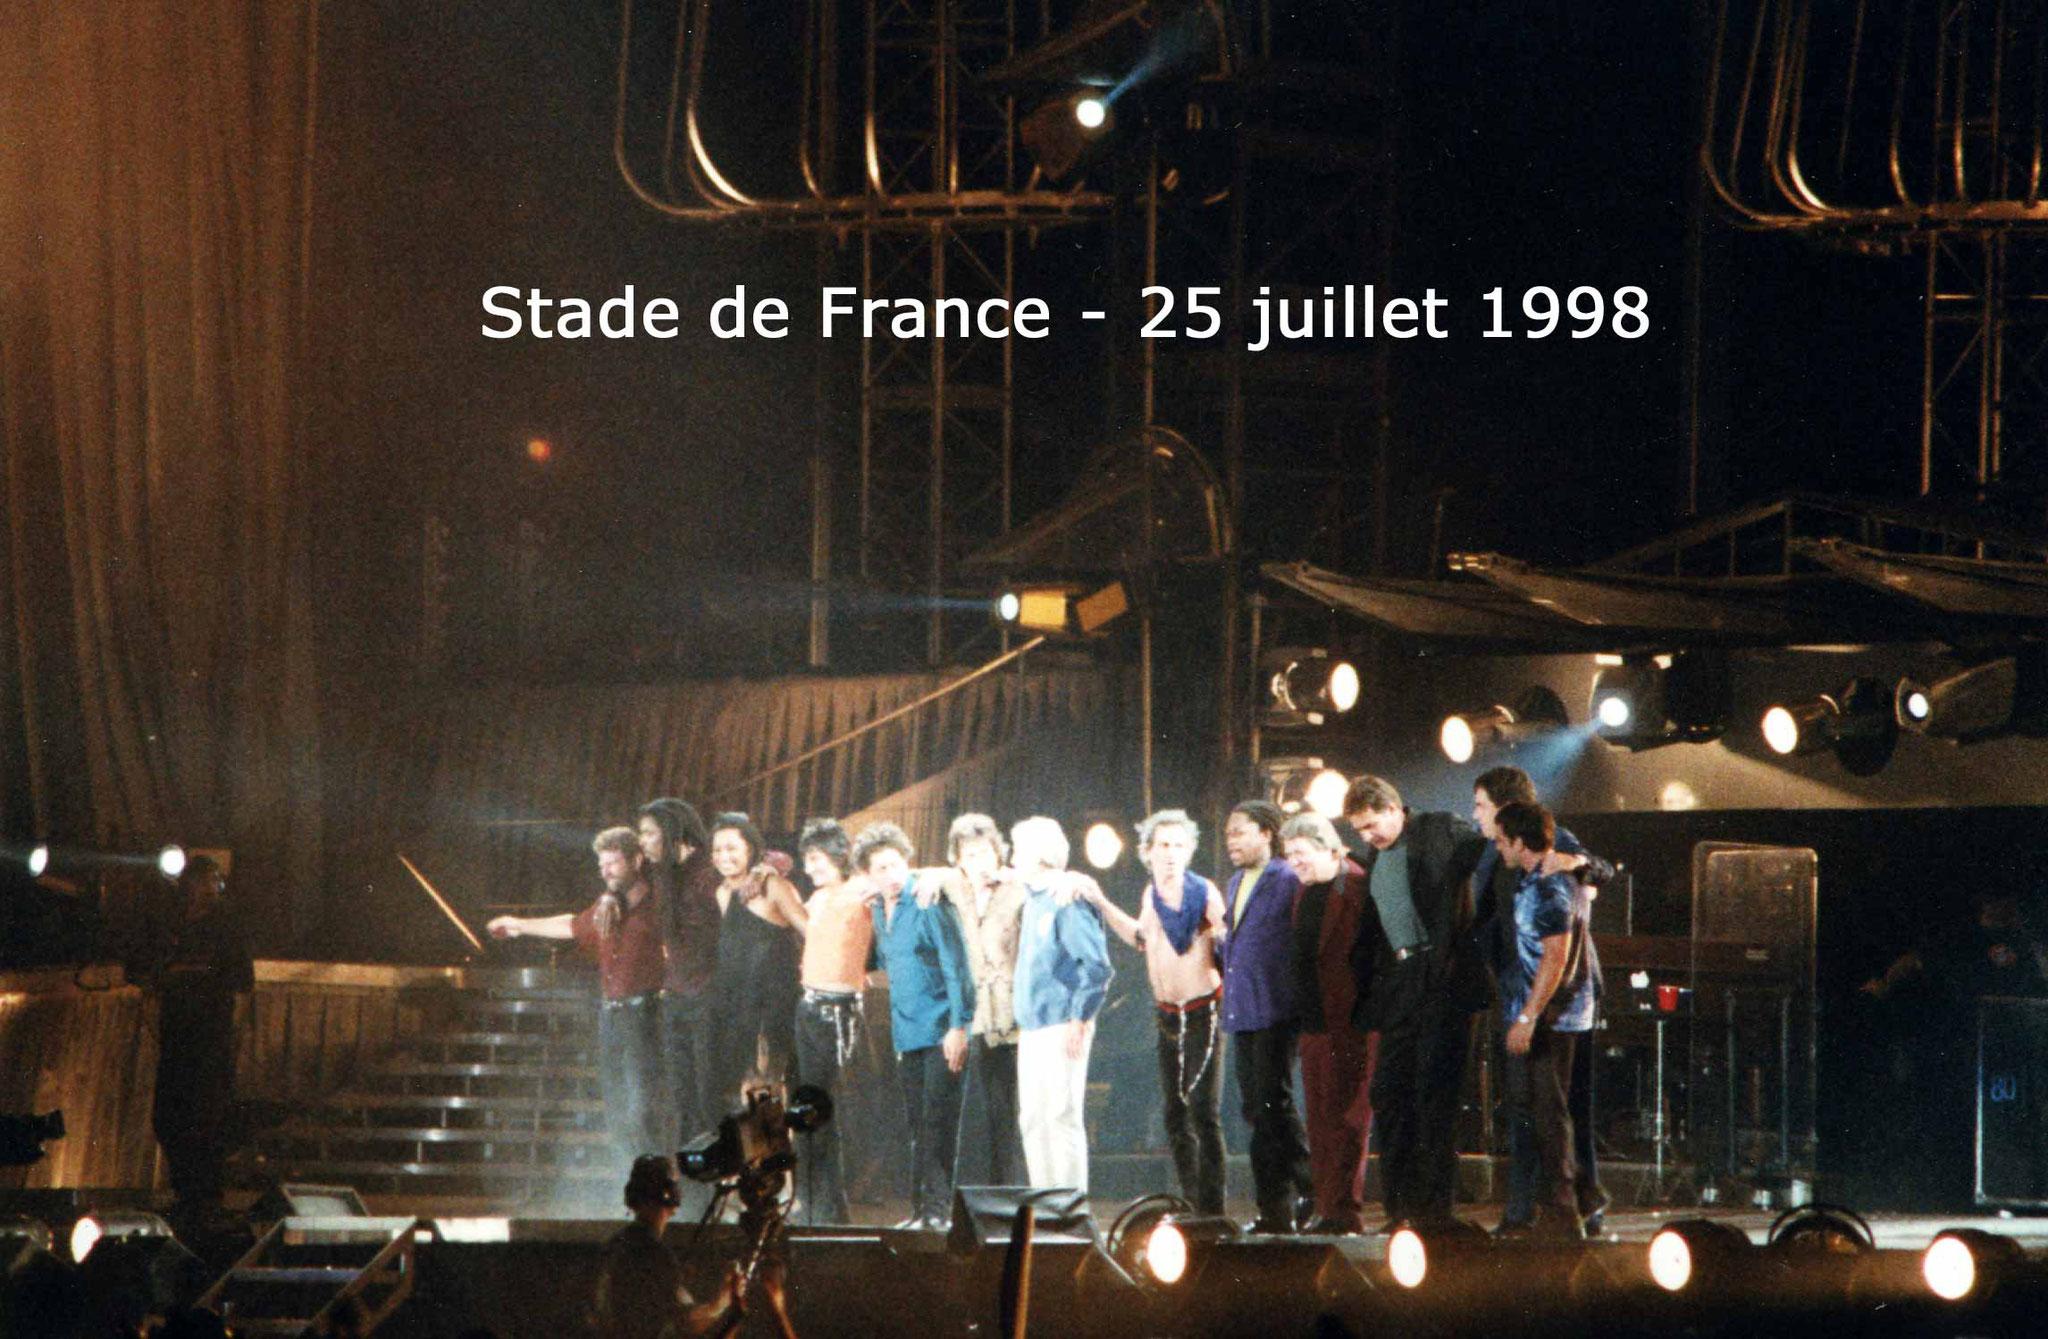 Stade de France 1998